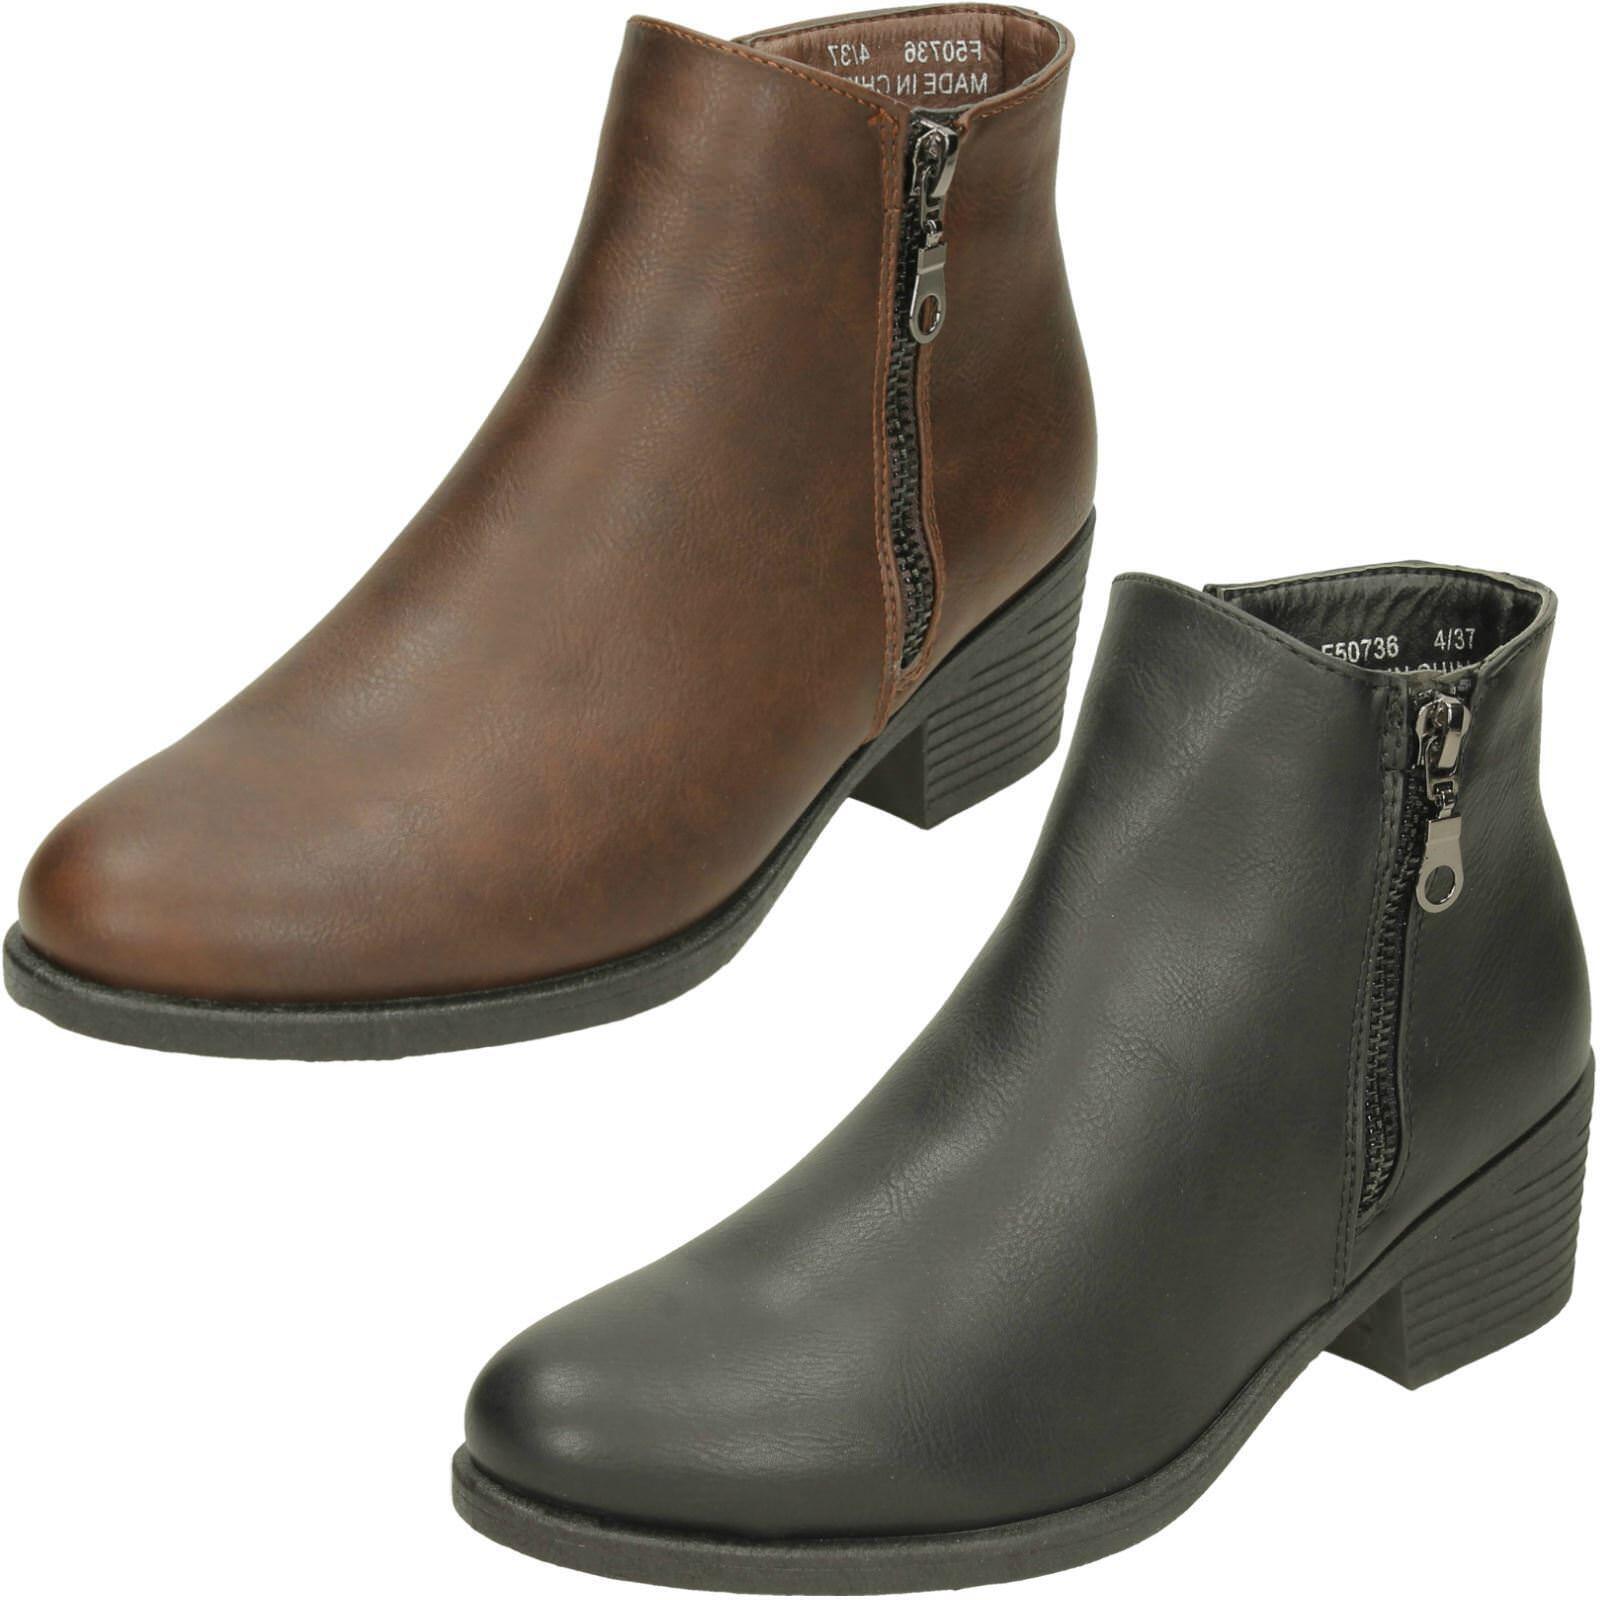 Ladies Spot On Zip Up Mid Heel Ankle Boots